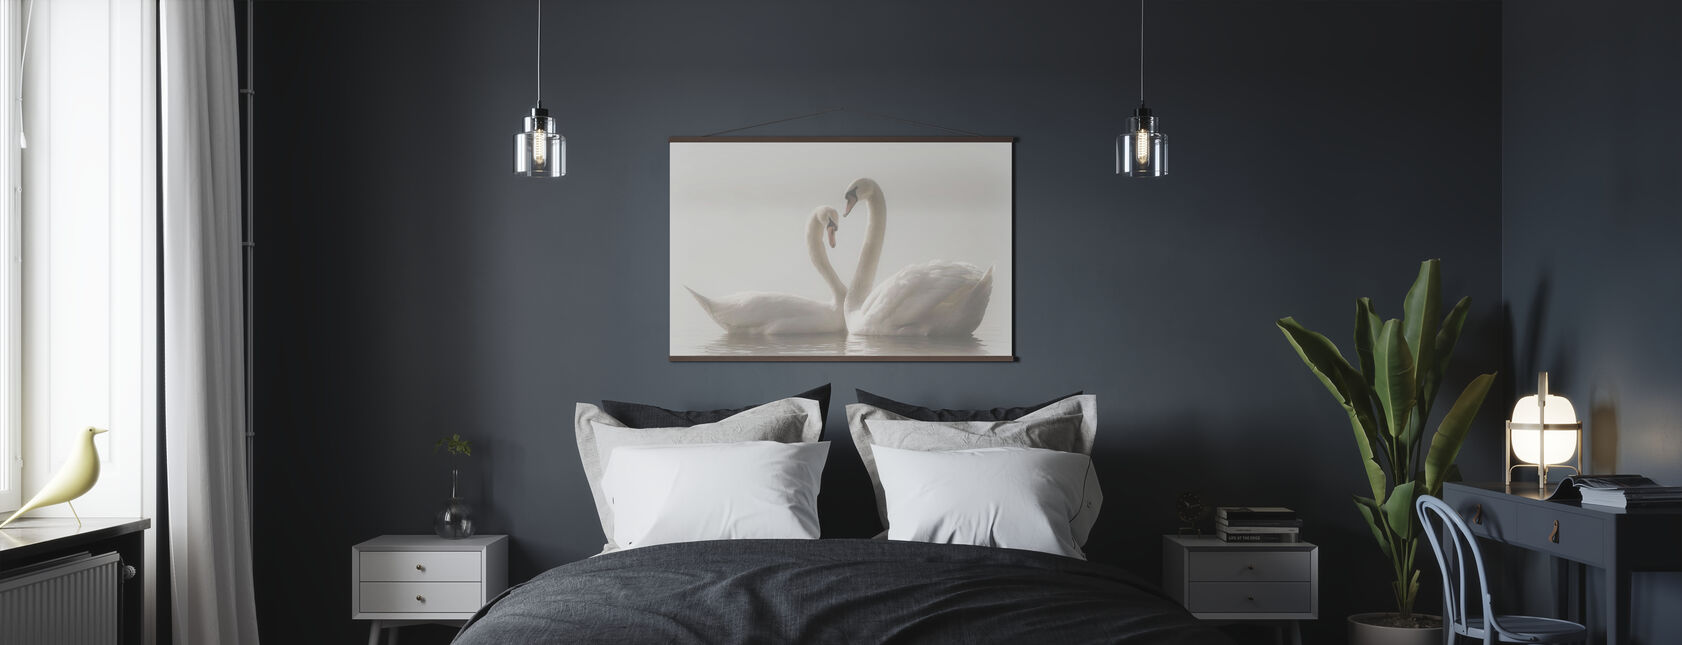 Forever - Poster - Bedroom